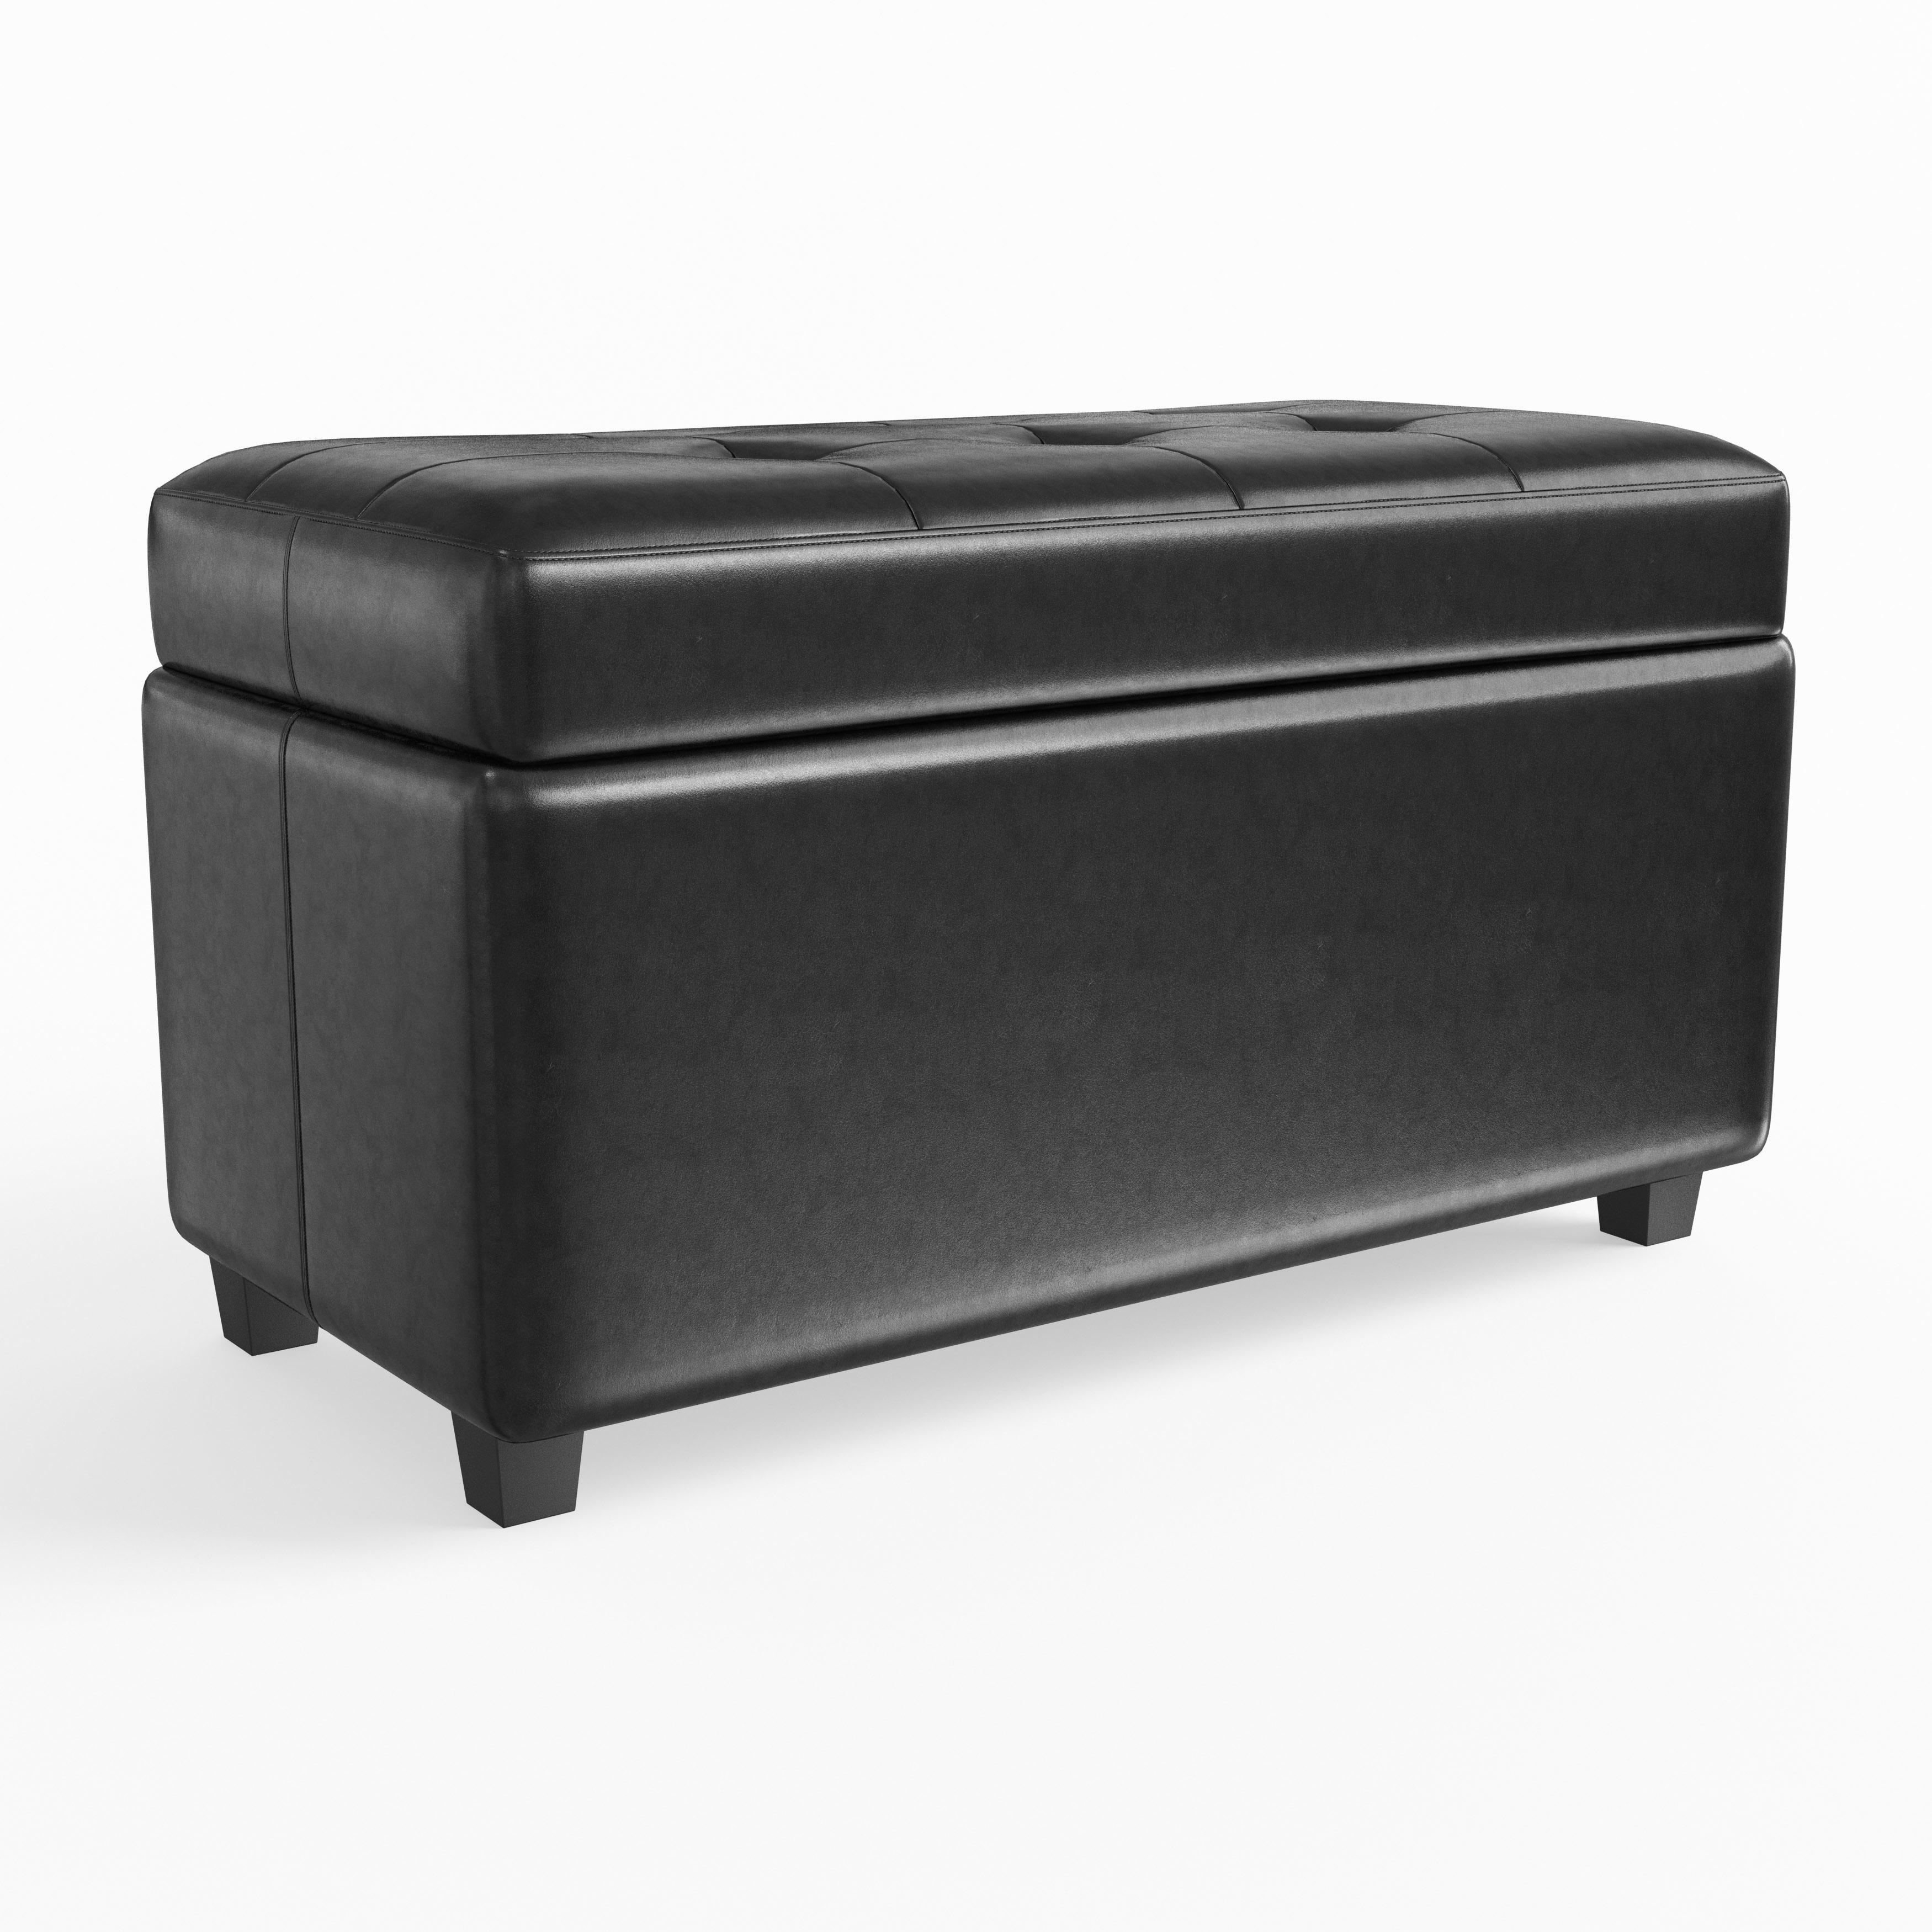 Buy Kidsu0027 Storage U0026 Toy Boxes Online At Overstock.com | Our Best Kidsu0027 U0026  Toddler Furniture Deals